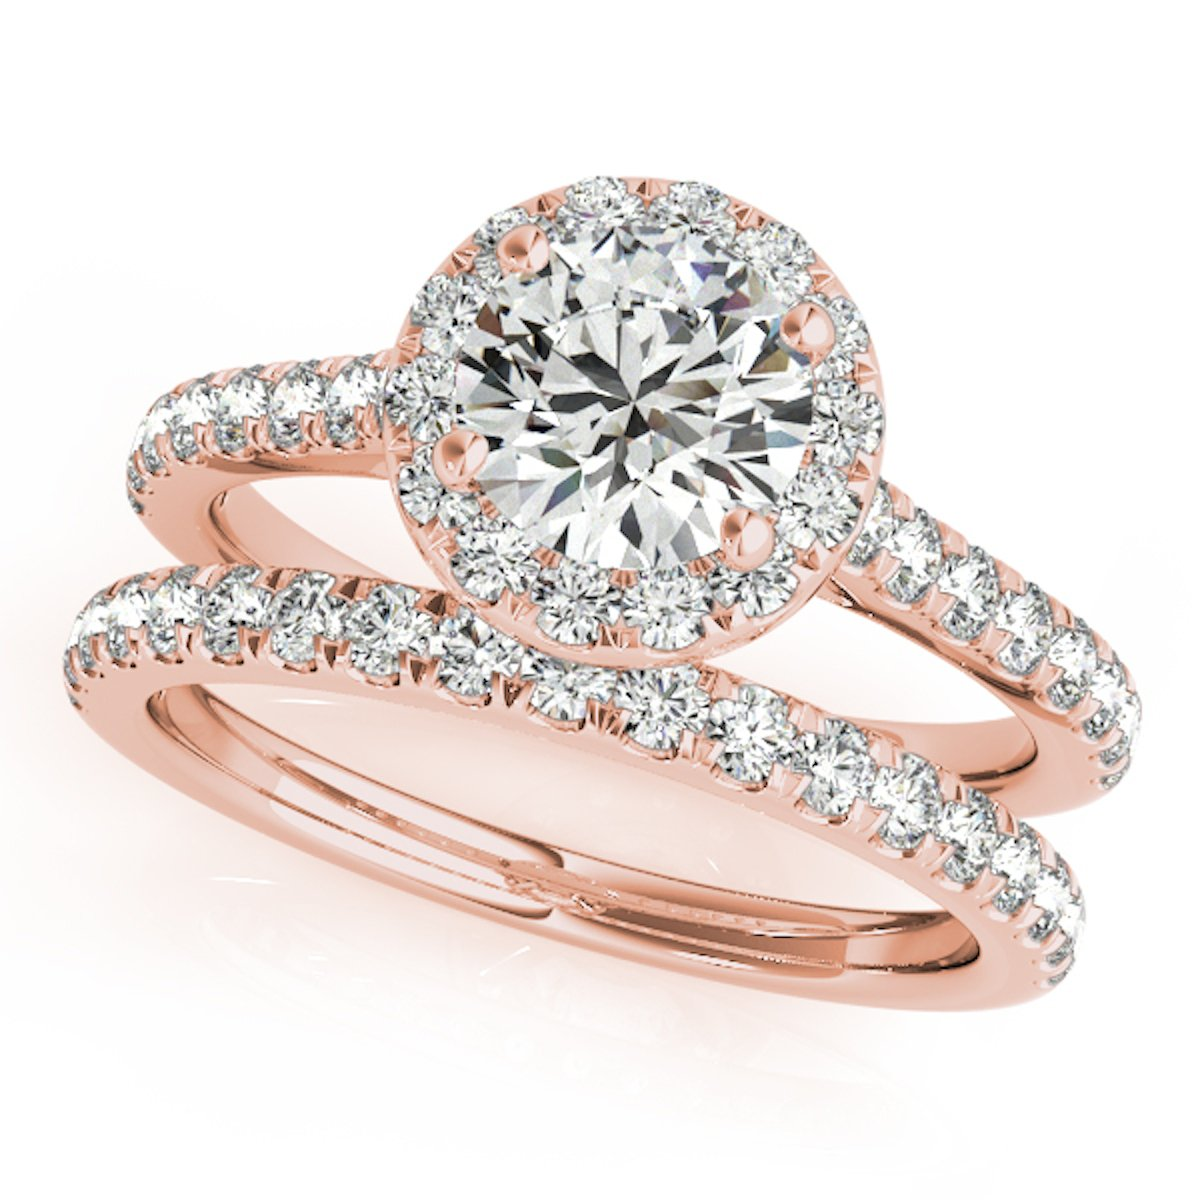 MauliJewels 0.75 Ct. Diamond Engagement Bridal Ring Set 14K Solid Rose Gold